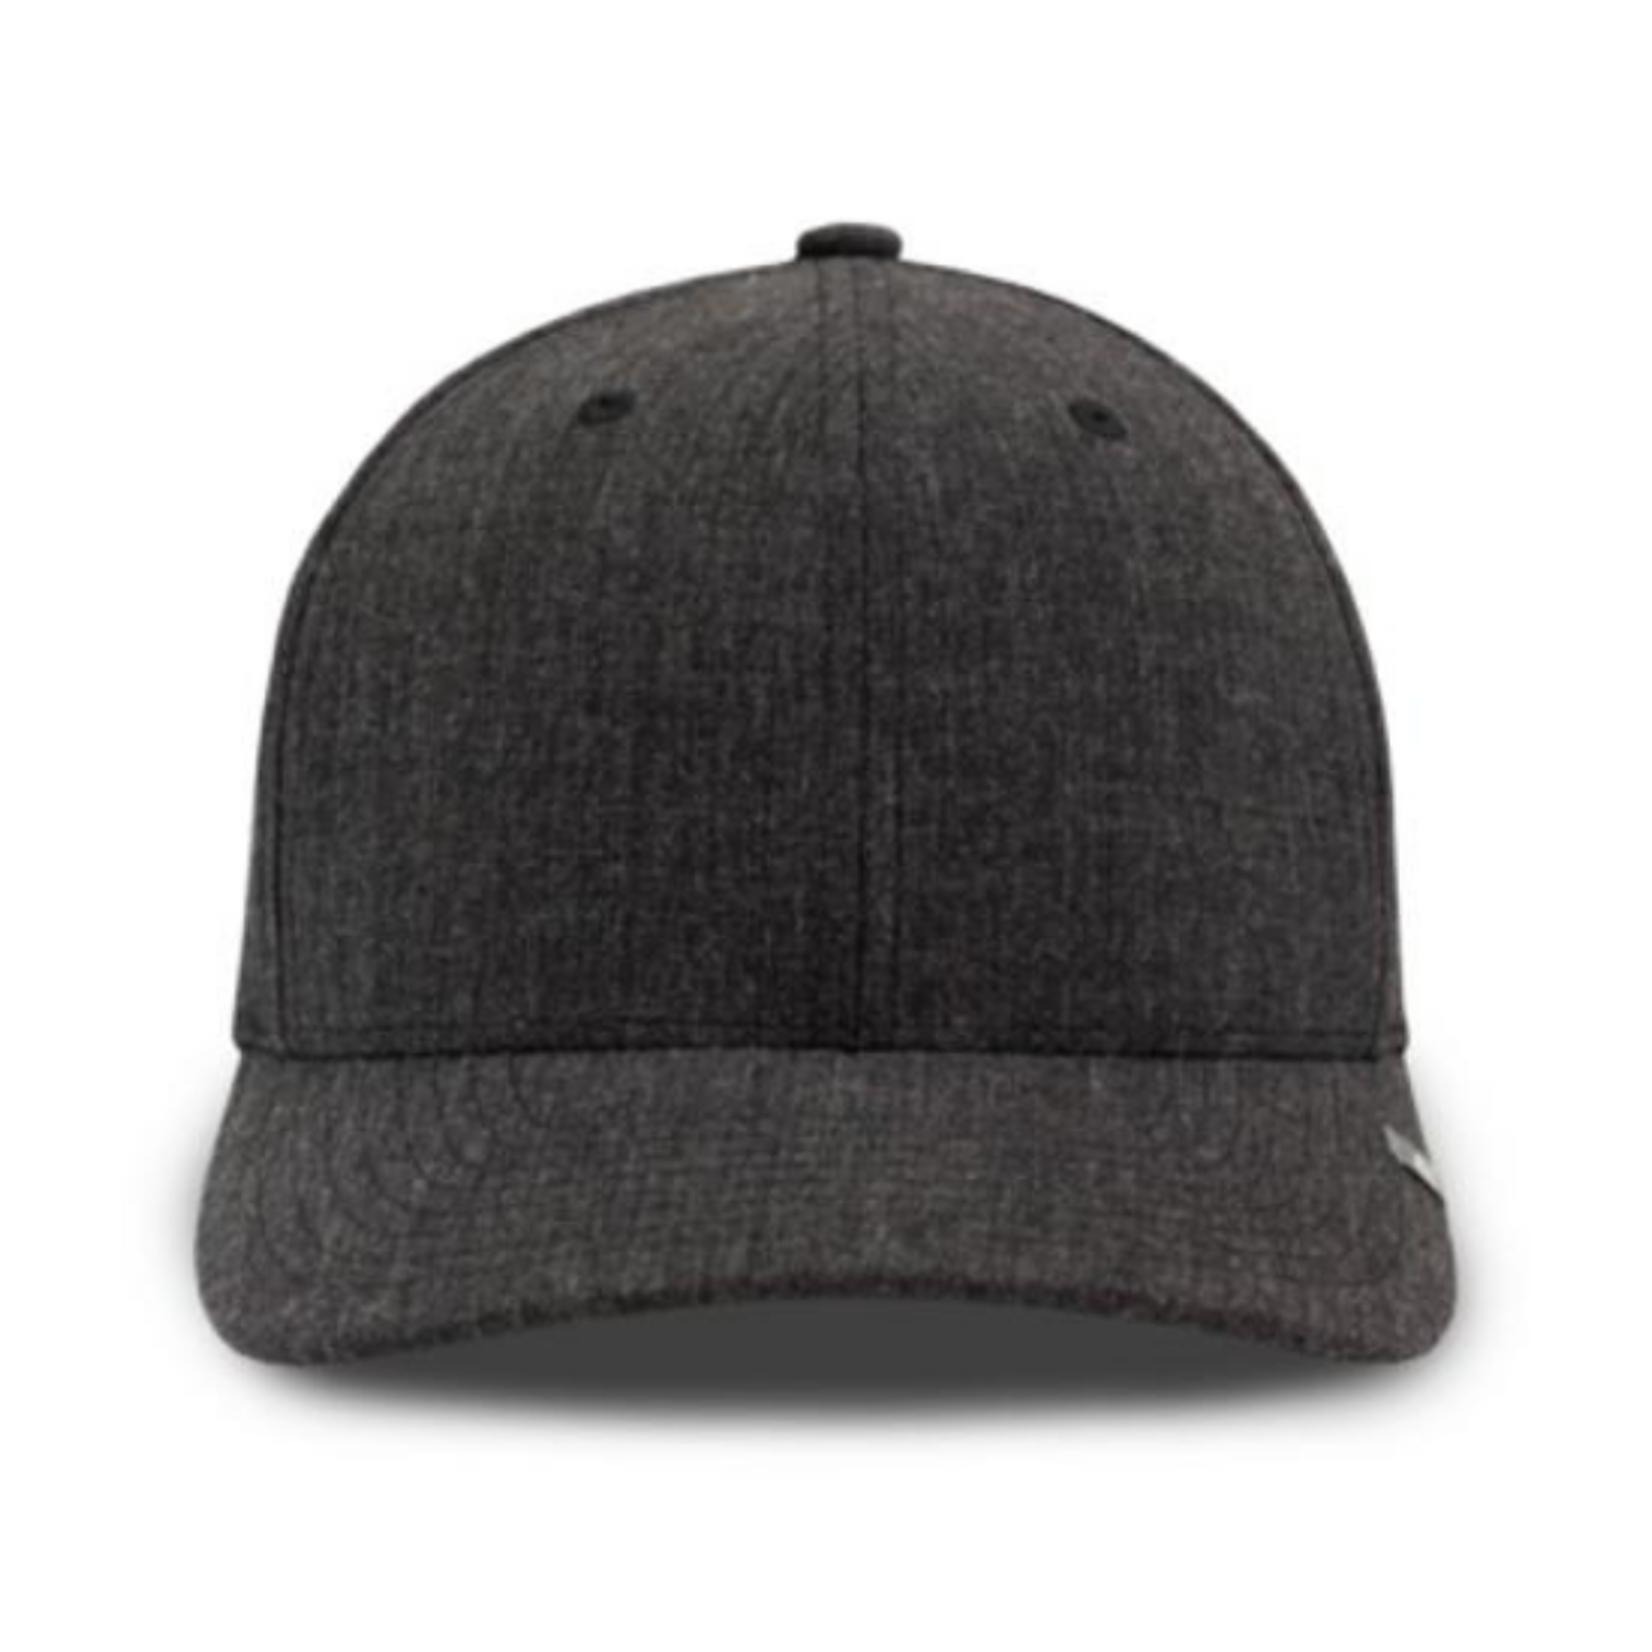 Travis Mathew Hats